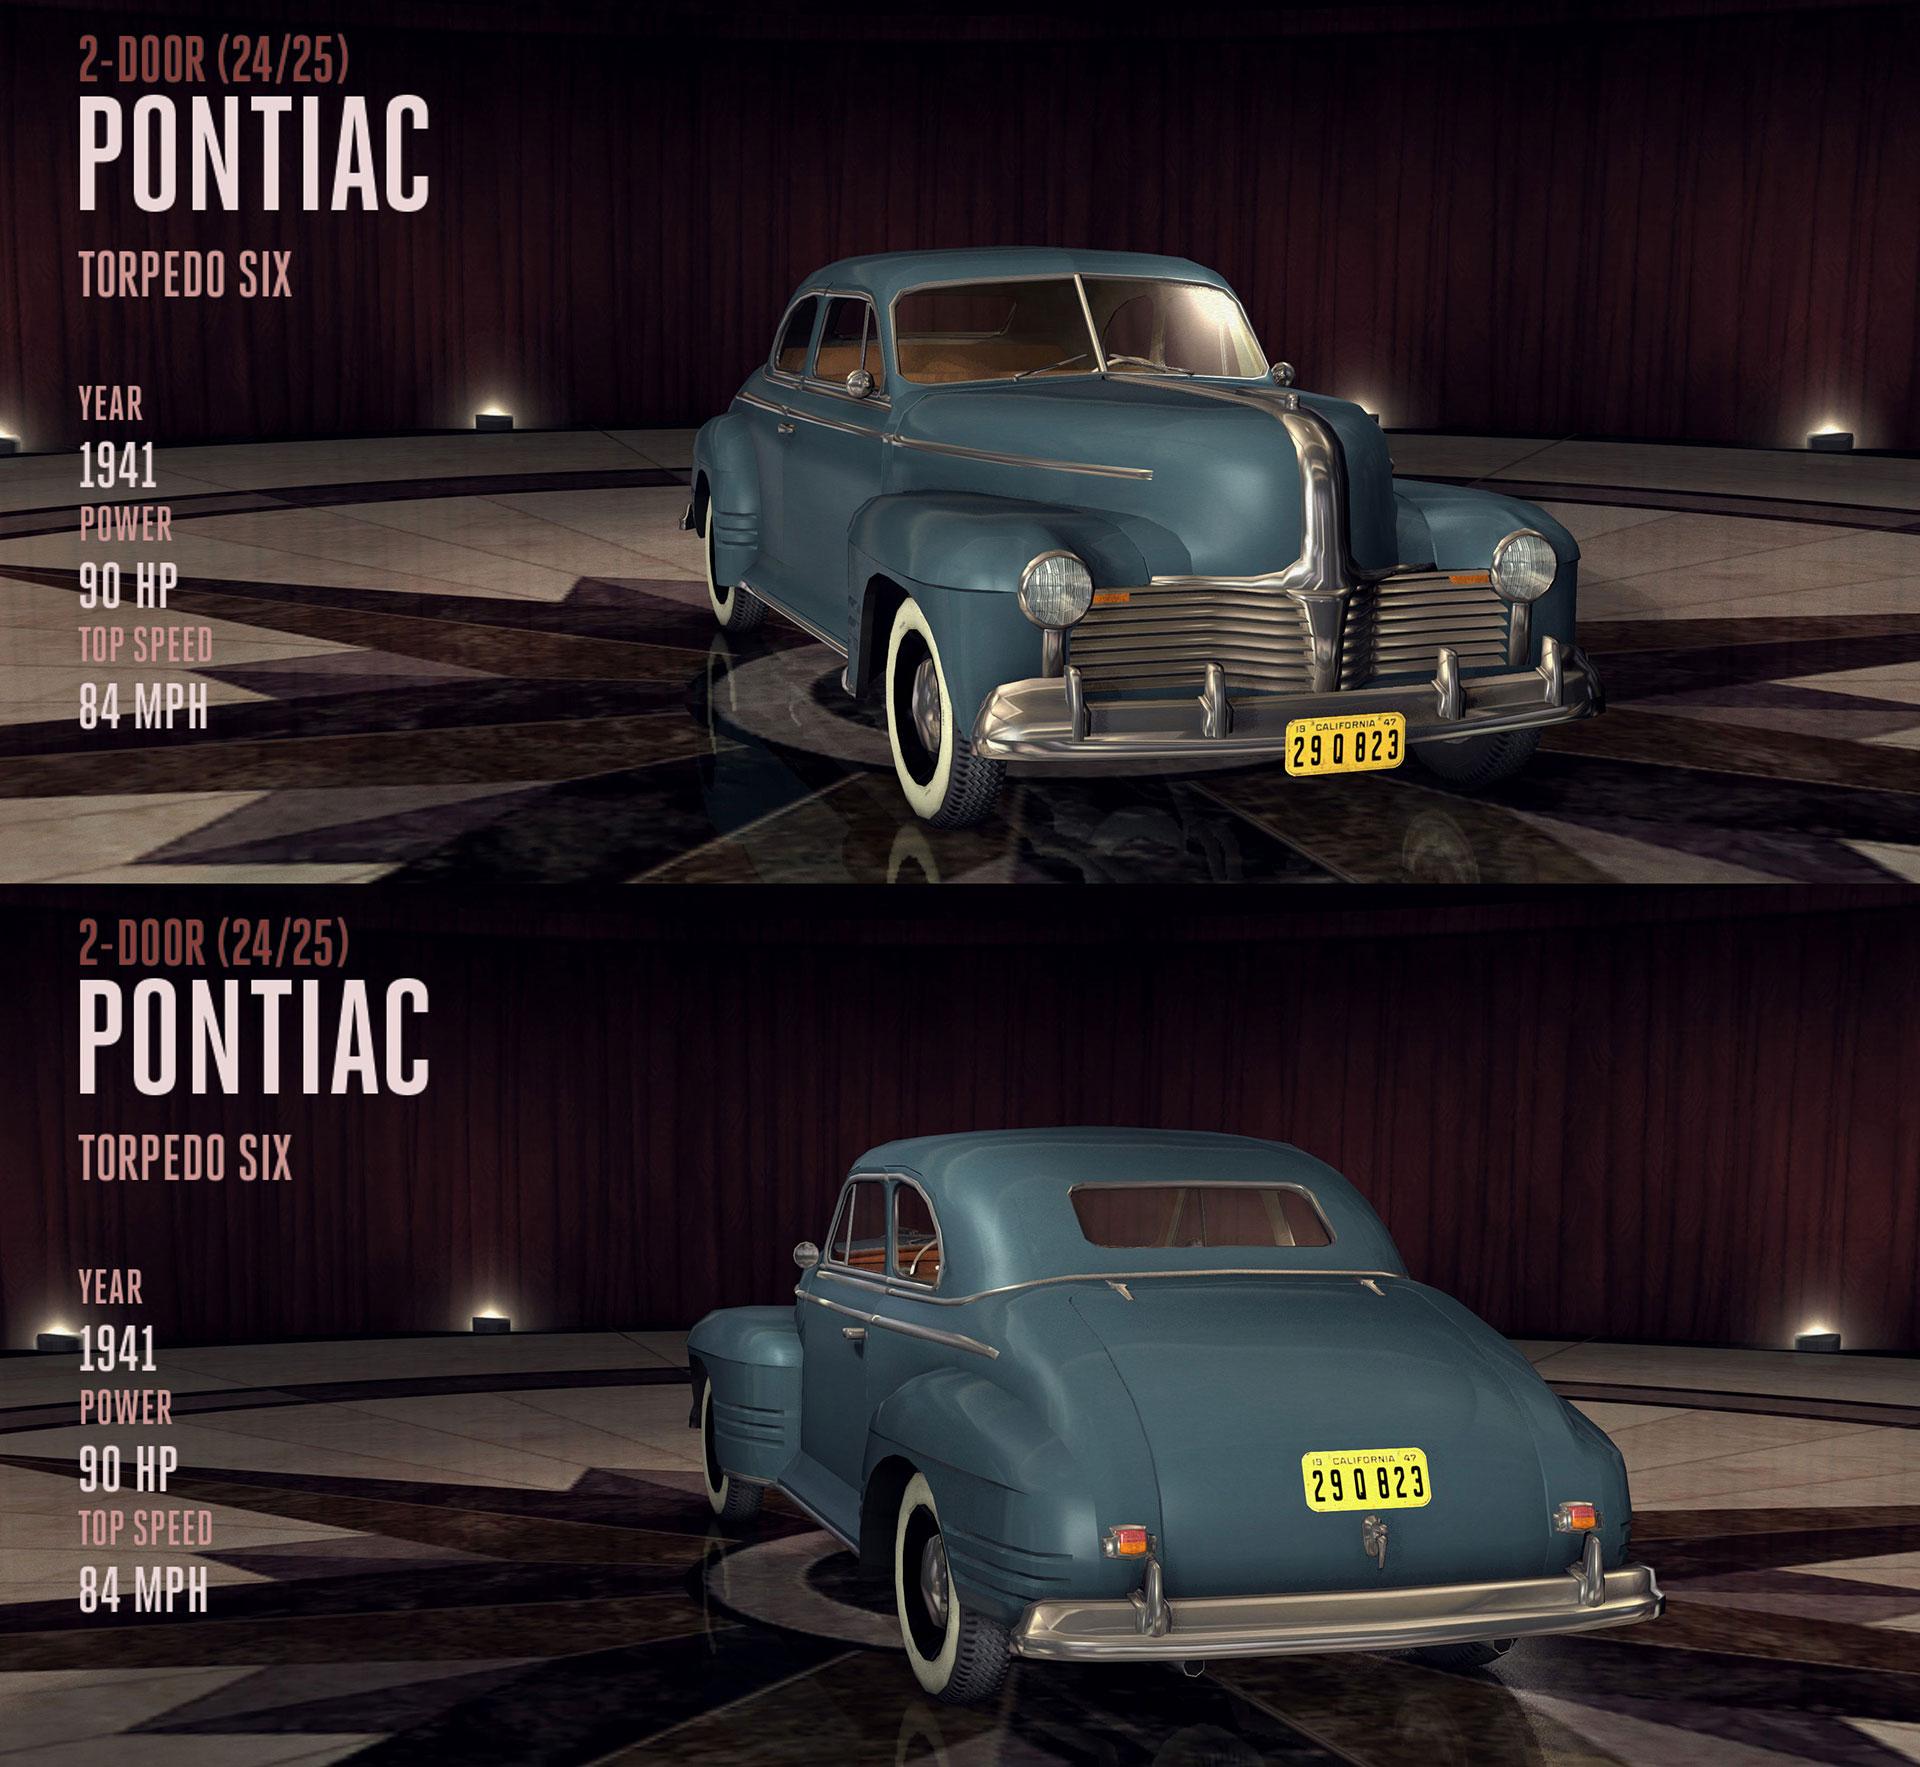 Archivo:1941-pontiac-torpedo-six.jpg